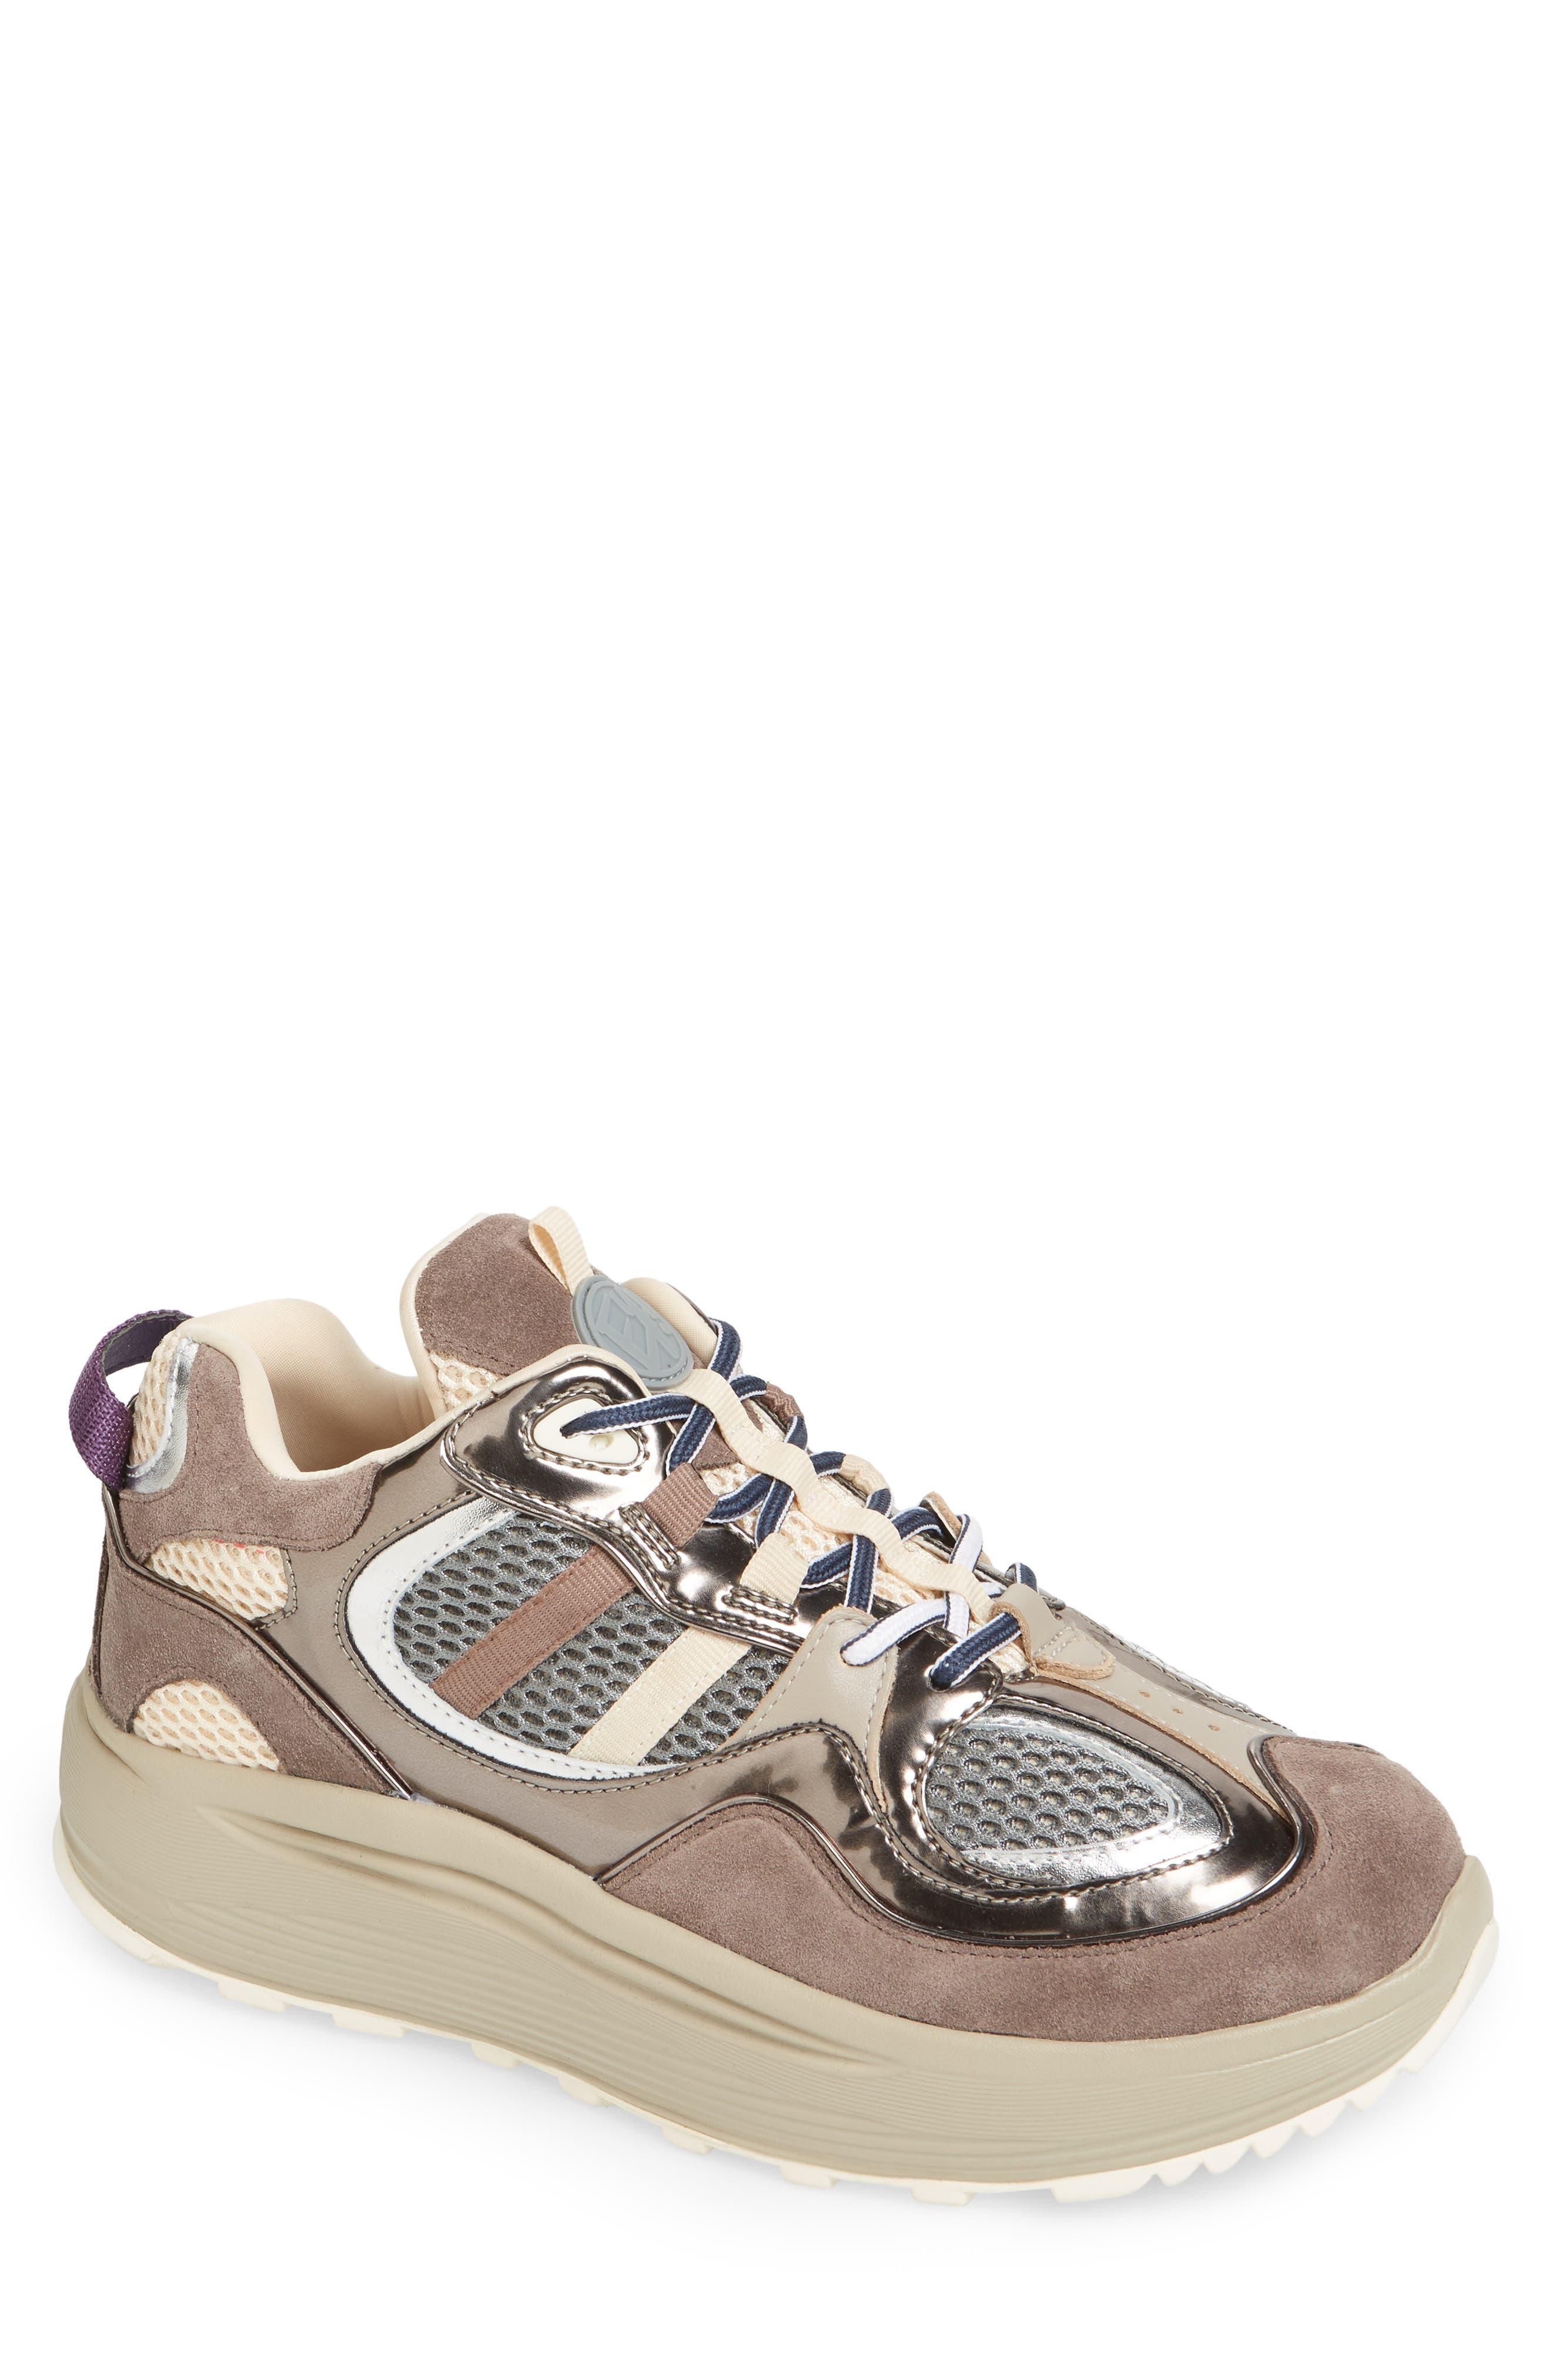 Jet Turbo Flatform Sneaker,                         Main,                         color, 060